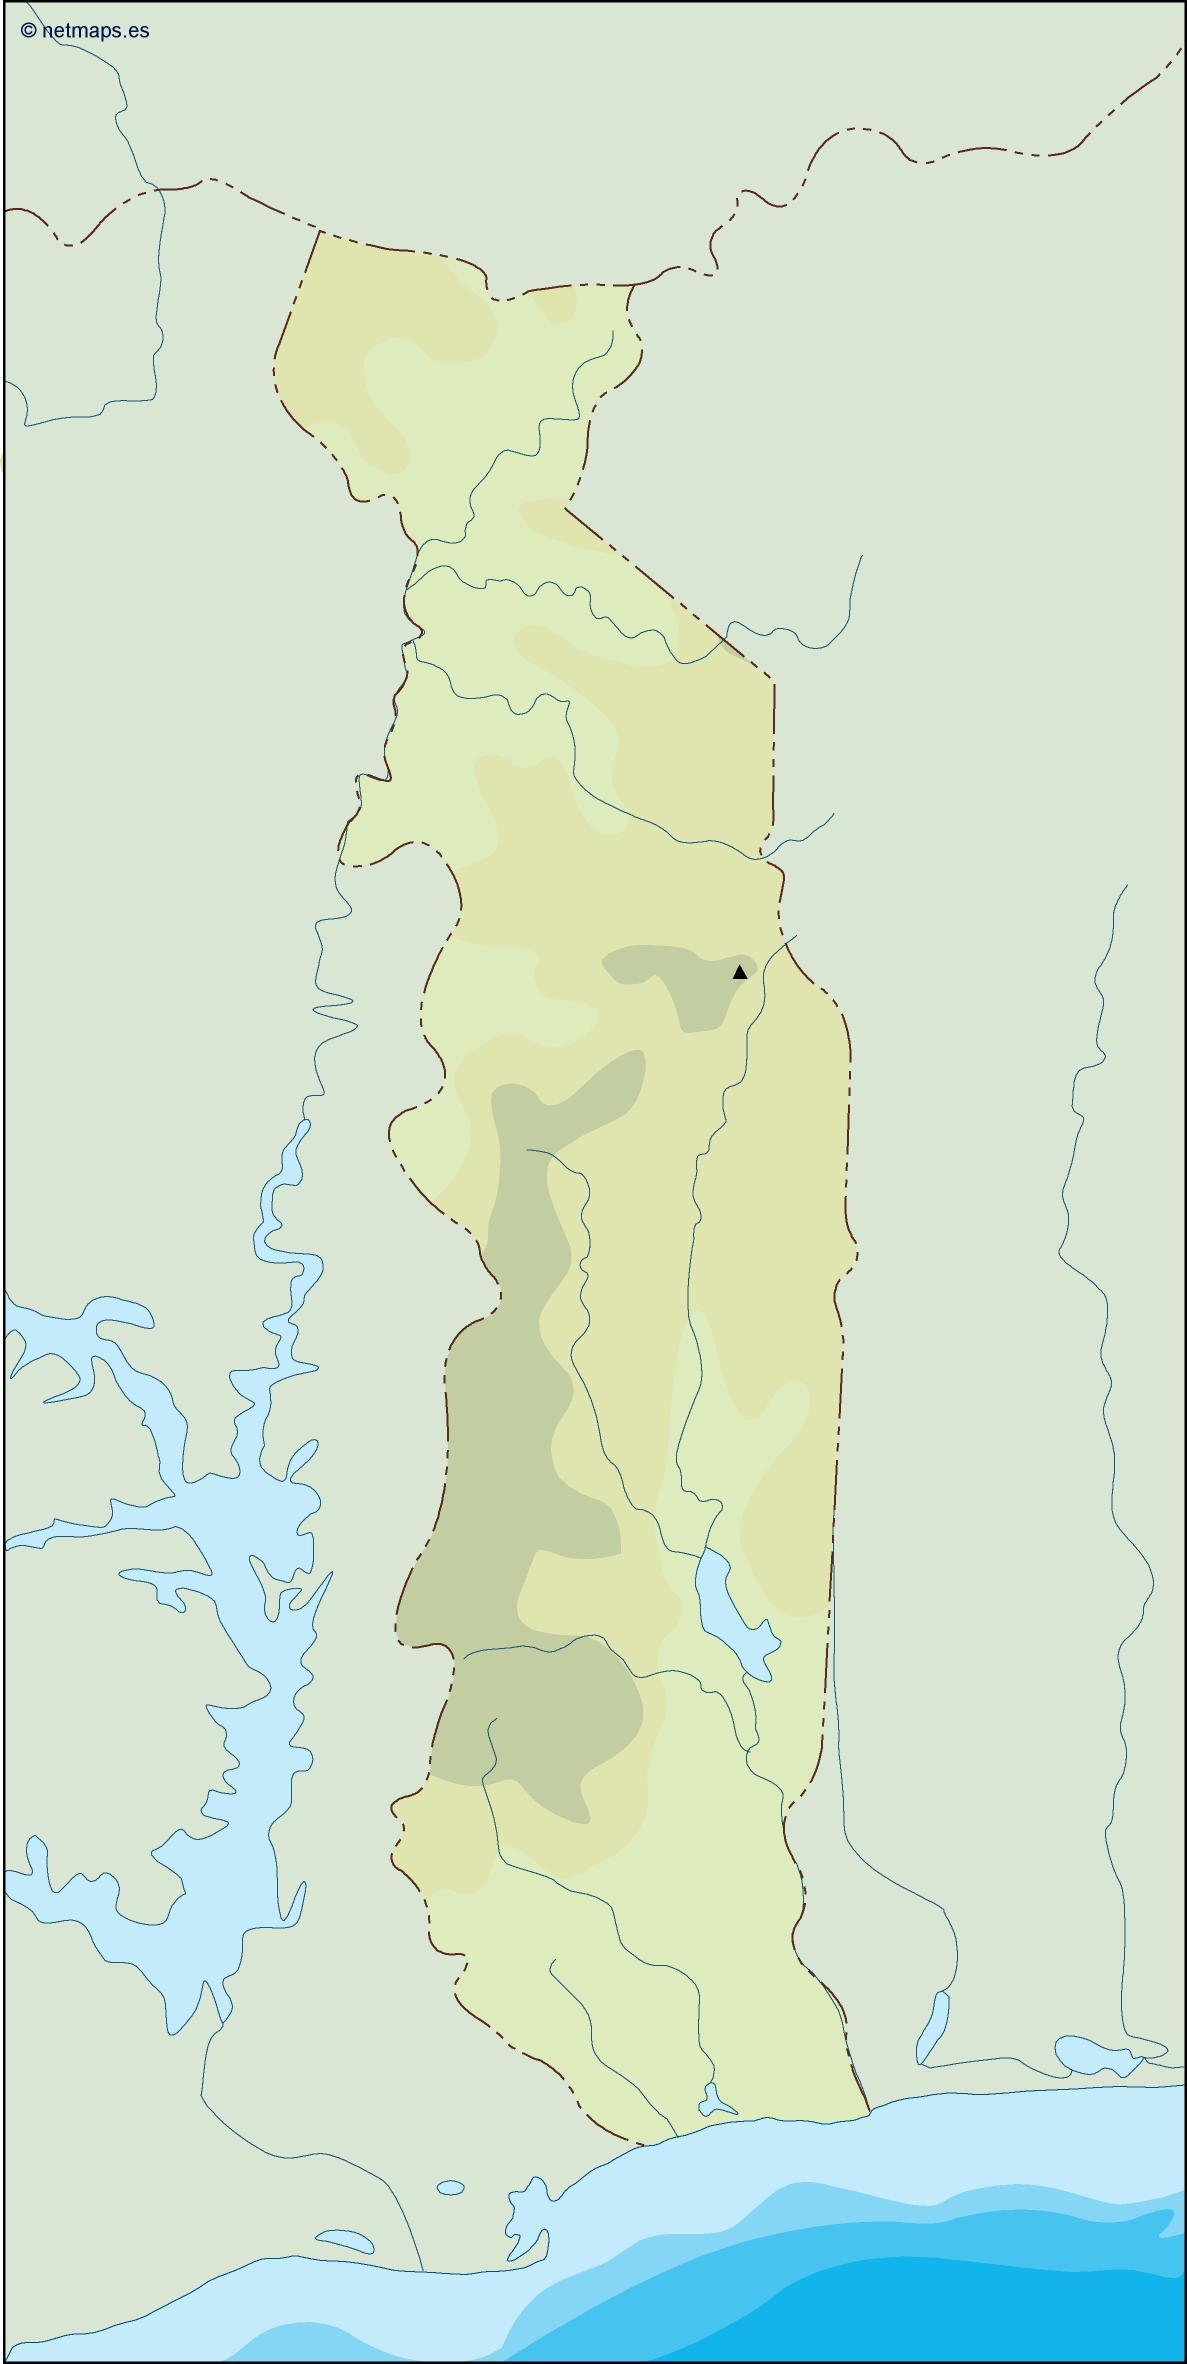 togo illustrator map on rwanda map, africa map, ghana map, sierra leone map, angola map, malawi map, libya map, switzerland map, benin map, kenya map, sudan map, tunisia map, sweden map, tonga map, uganda map, morocco map, egypt map, zimbabwe map, madagascar map, algeria map, usa map, burkina faso map, chad map, comoros map, mali map, nigeria map, niger map, senegal map, guadeloupe map, congo map, namibia map, mozambique map, bahrain map, ethiopia map,